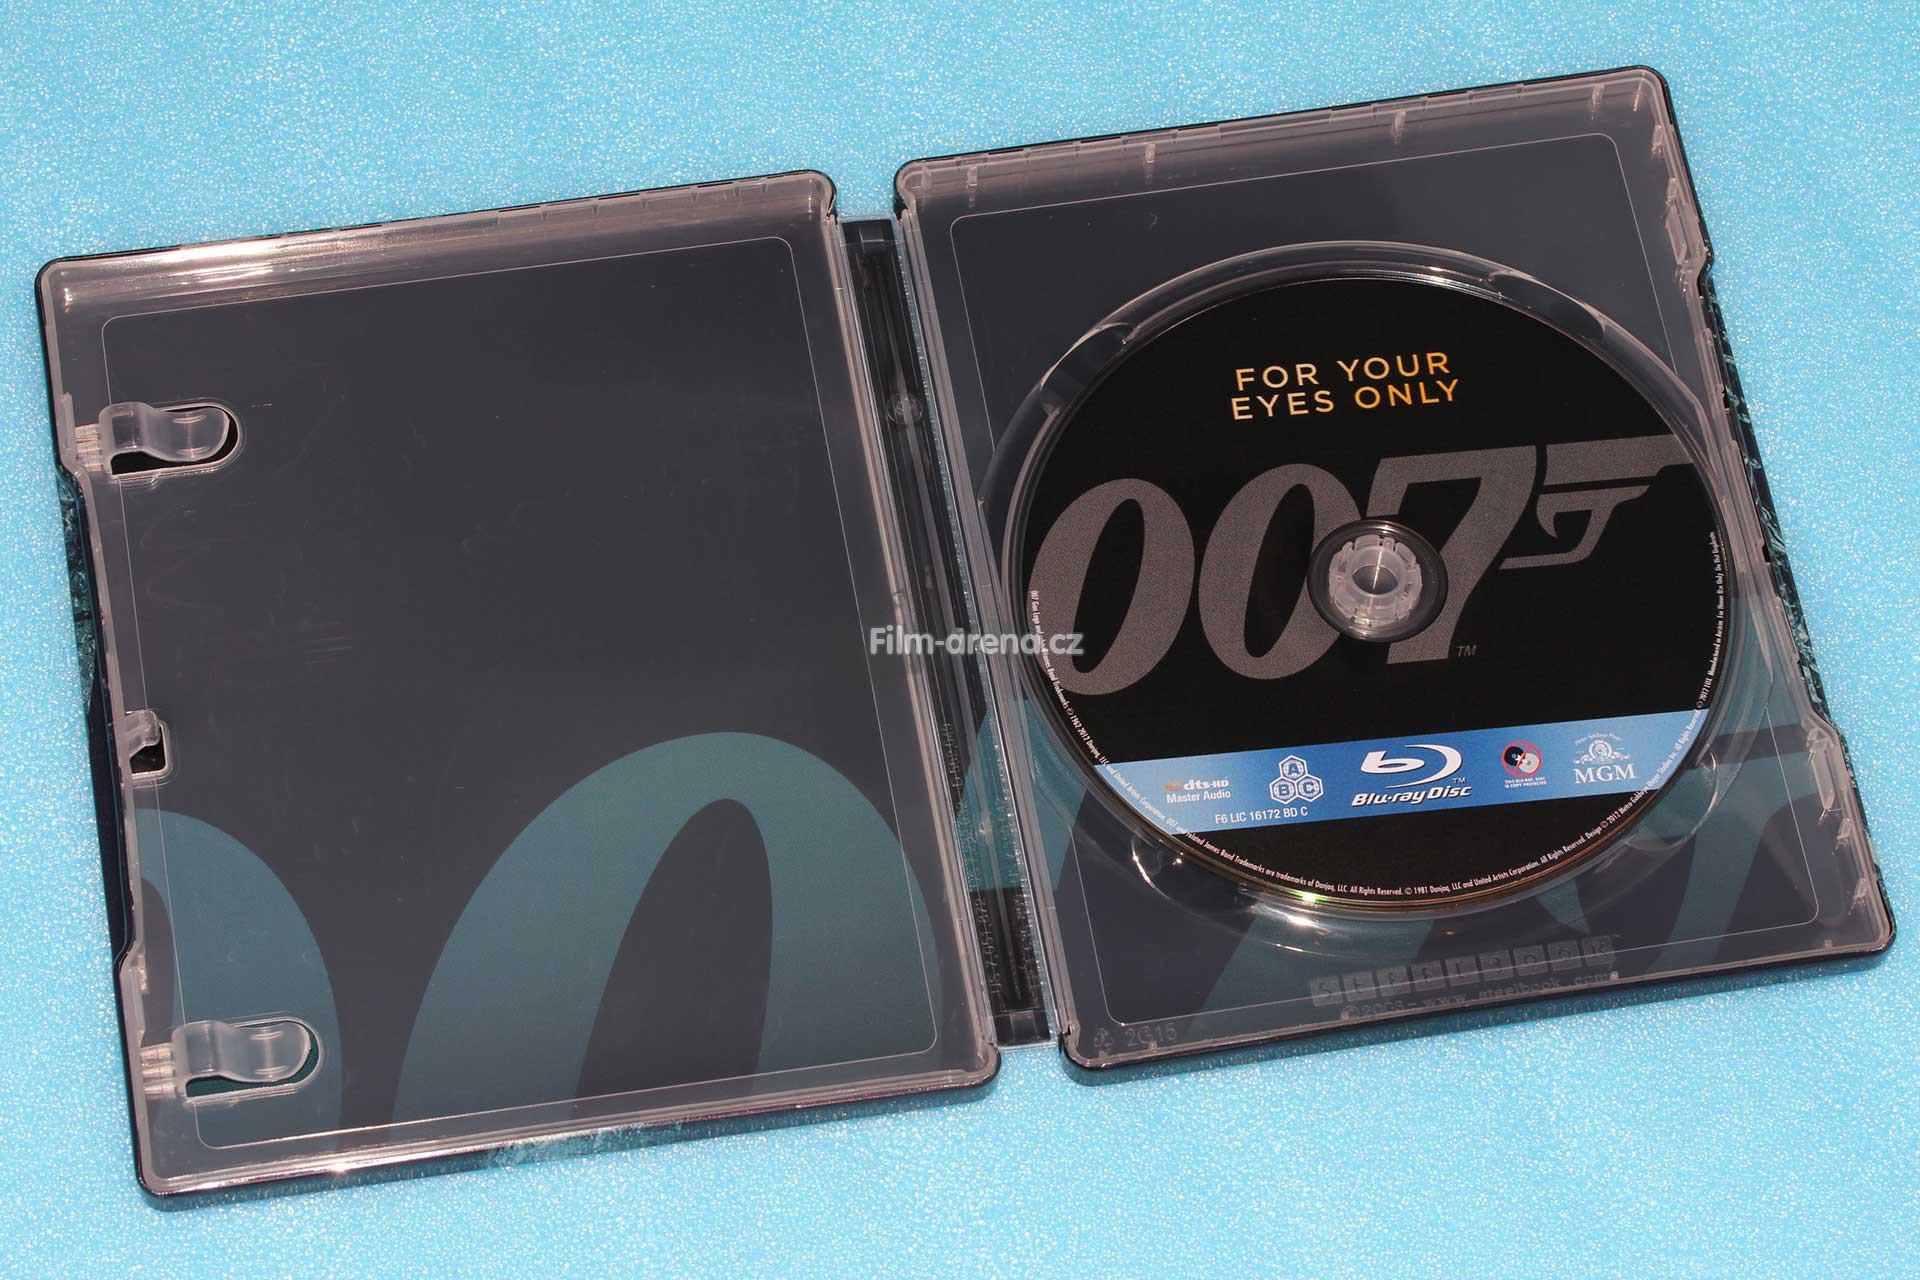 http://www.filmarena.cz/upload/images/nazivo/James_Bond/1981_Jen_pro_tve_oci/1981_oci_04.jpg